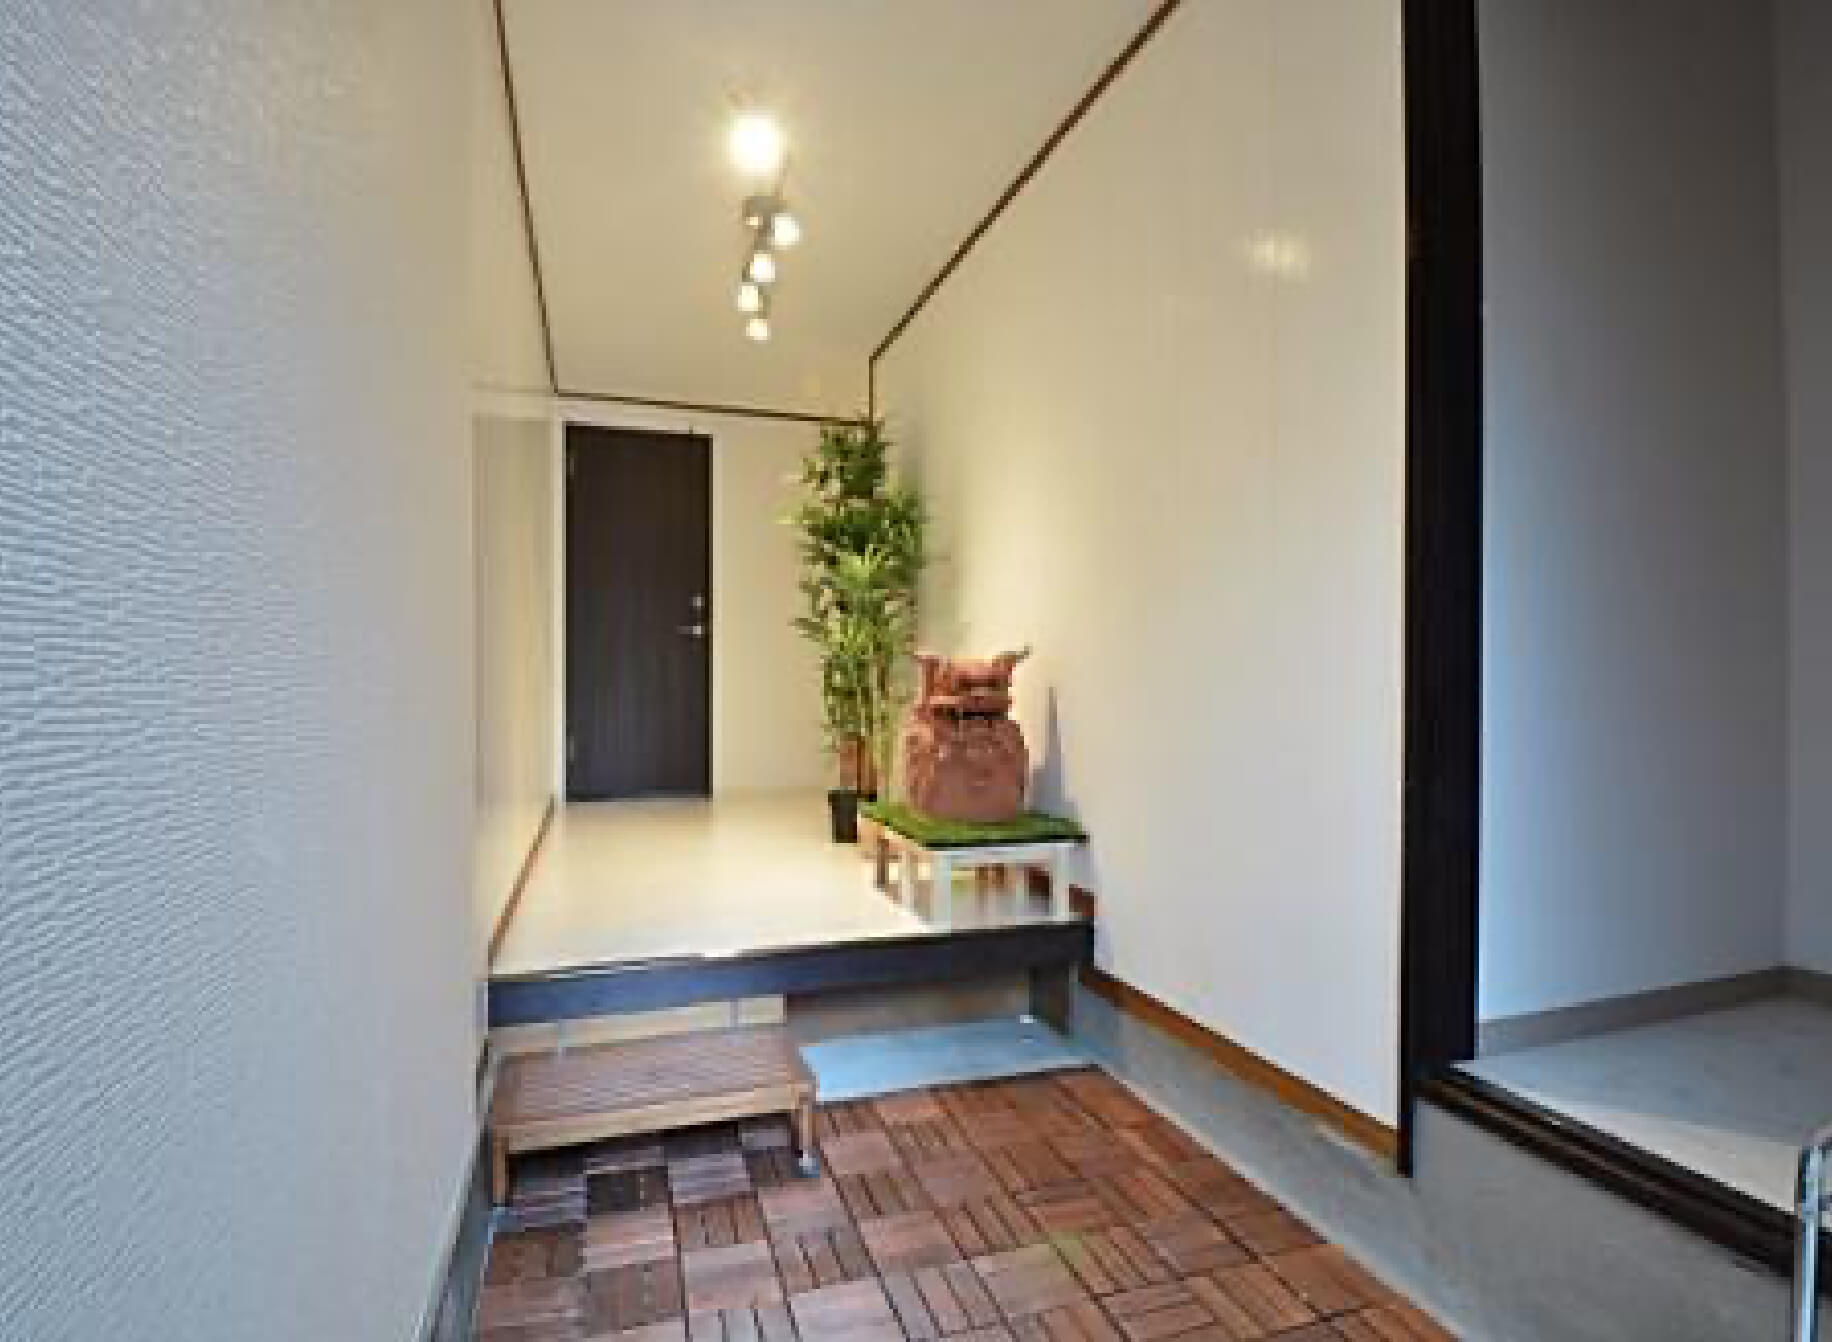 Share house kikuya Tsuruhashi Tamatsukuri Tida House